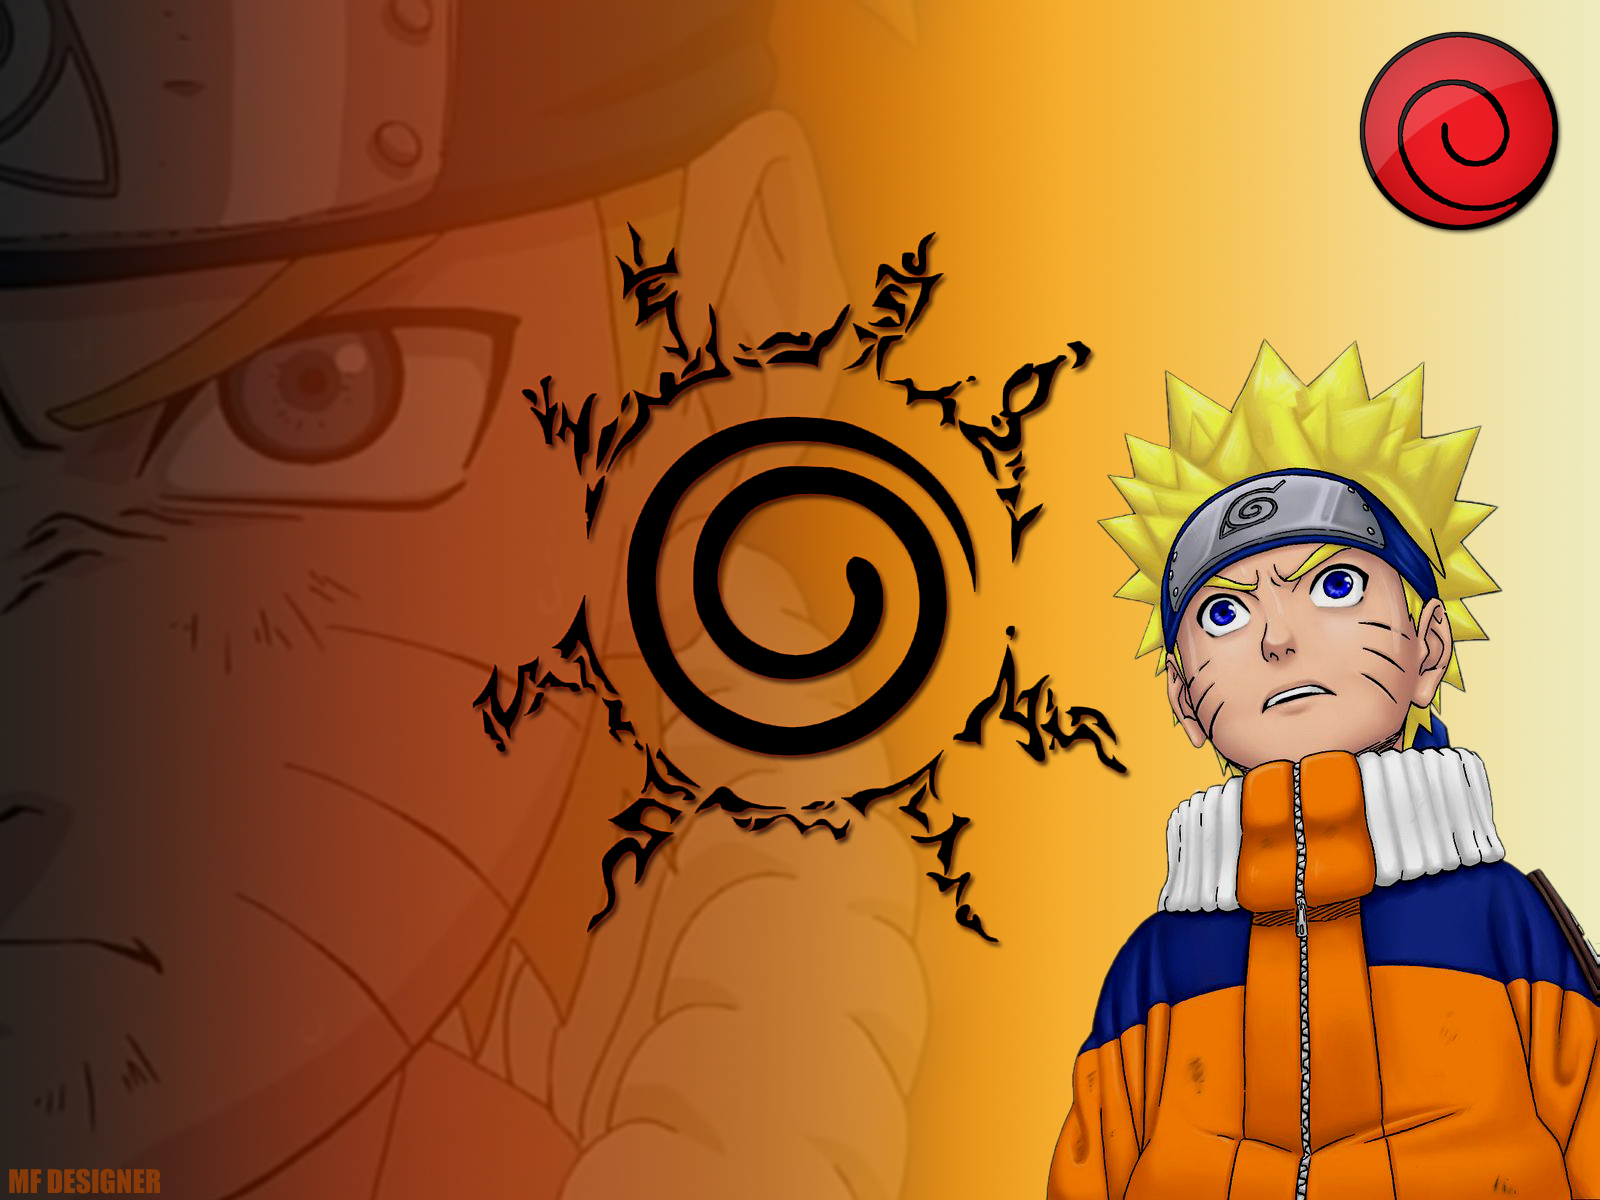 Naruto Nine Tails Seal wallpaper 82295 1600x1200